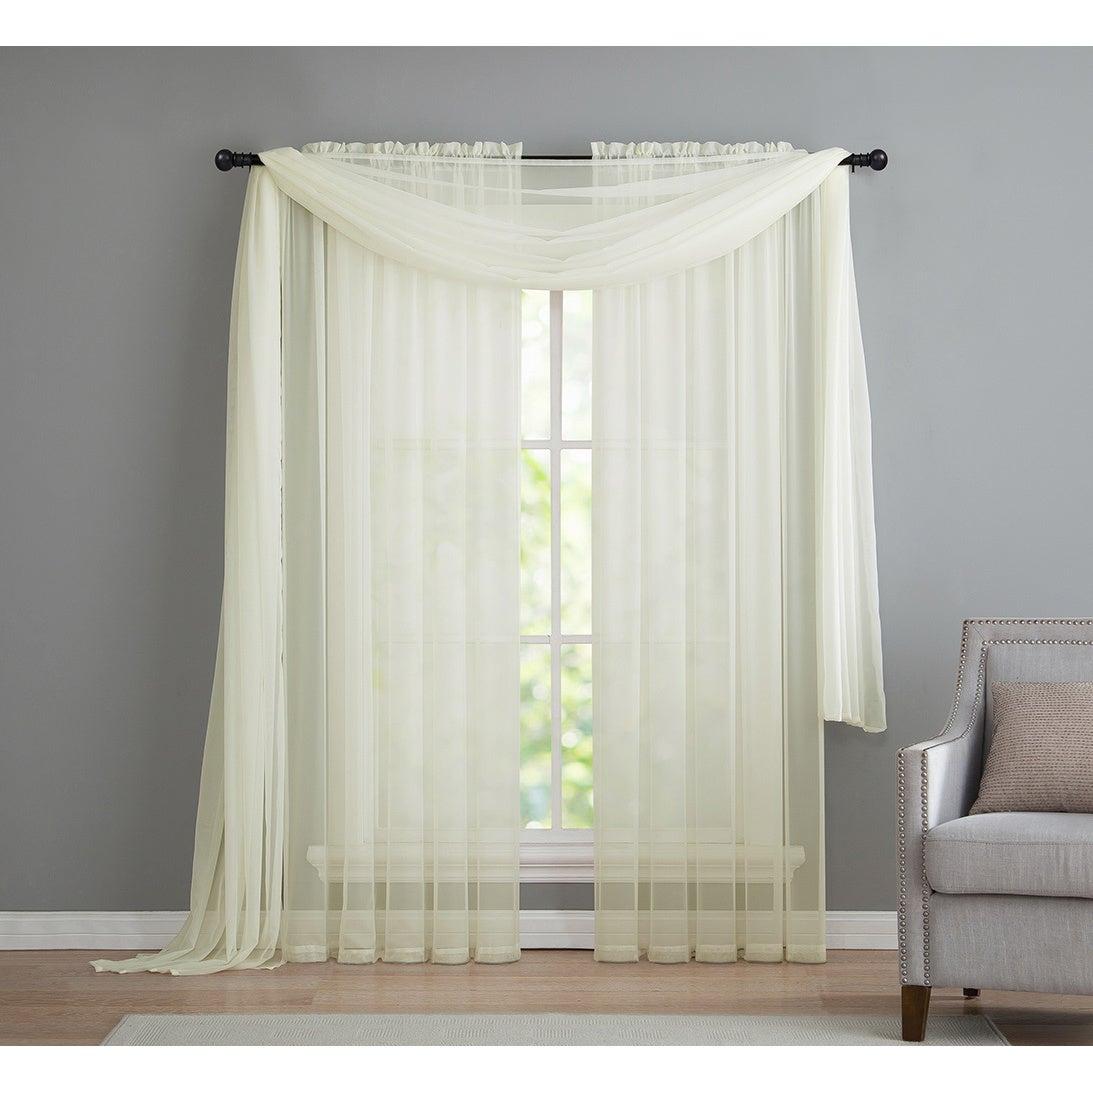 Popular Photo of Infinity Sheer Rod Pocket Curtain Panels